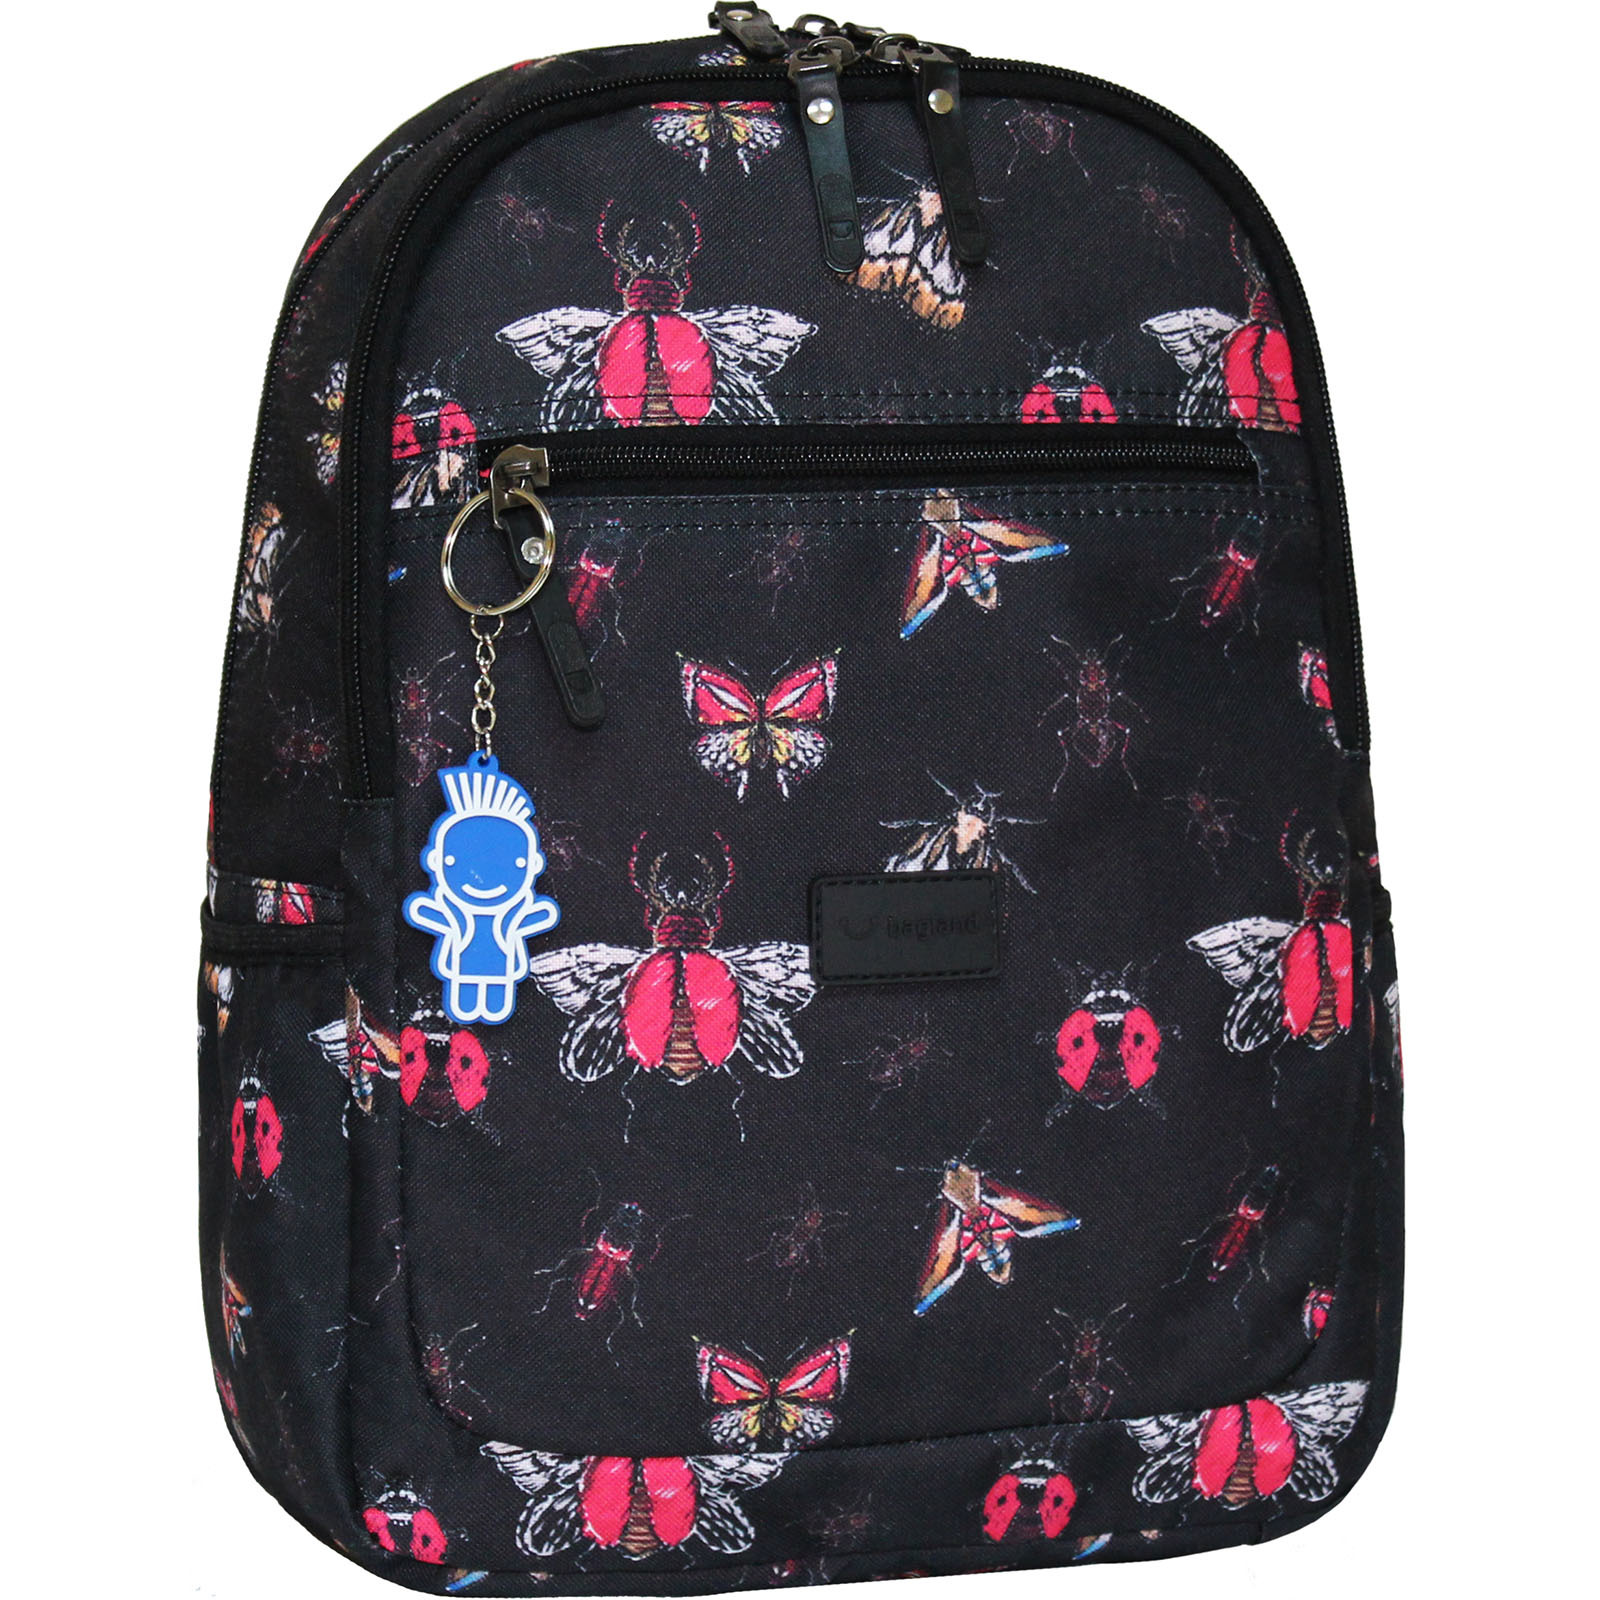 Детские рюкзаки Рюкзак Bagland Young 13 л. сублімація 154 (00510664) IMG_8617_арт.154_.JPG